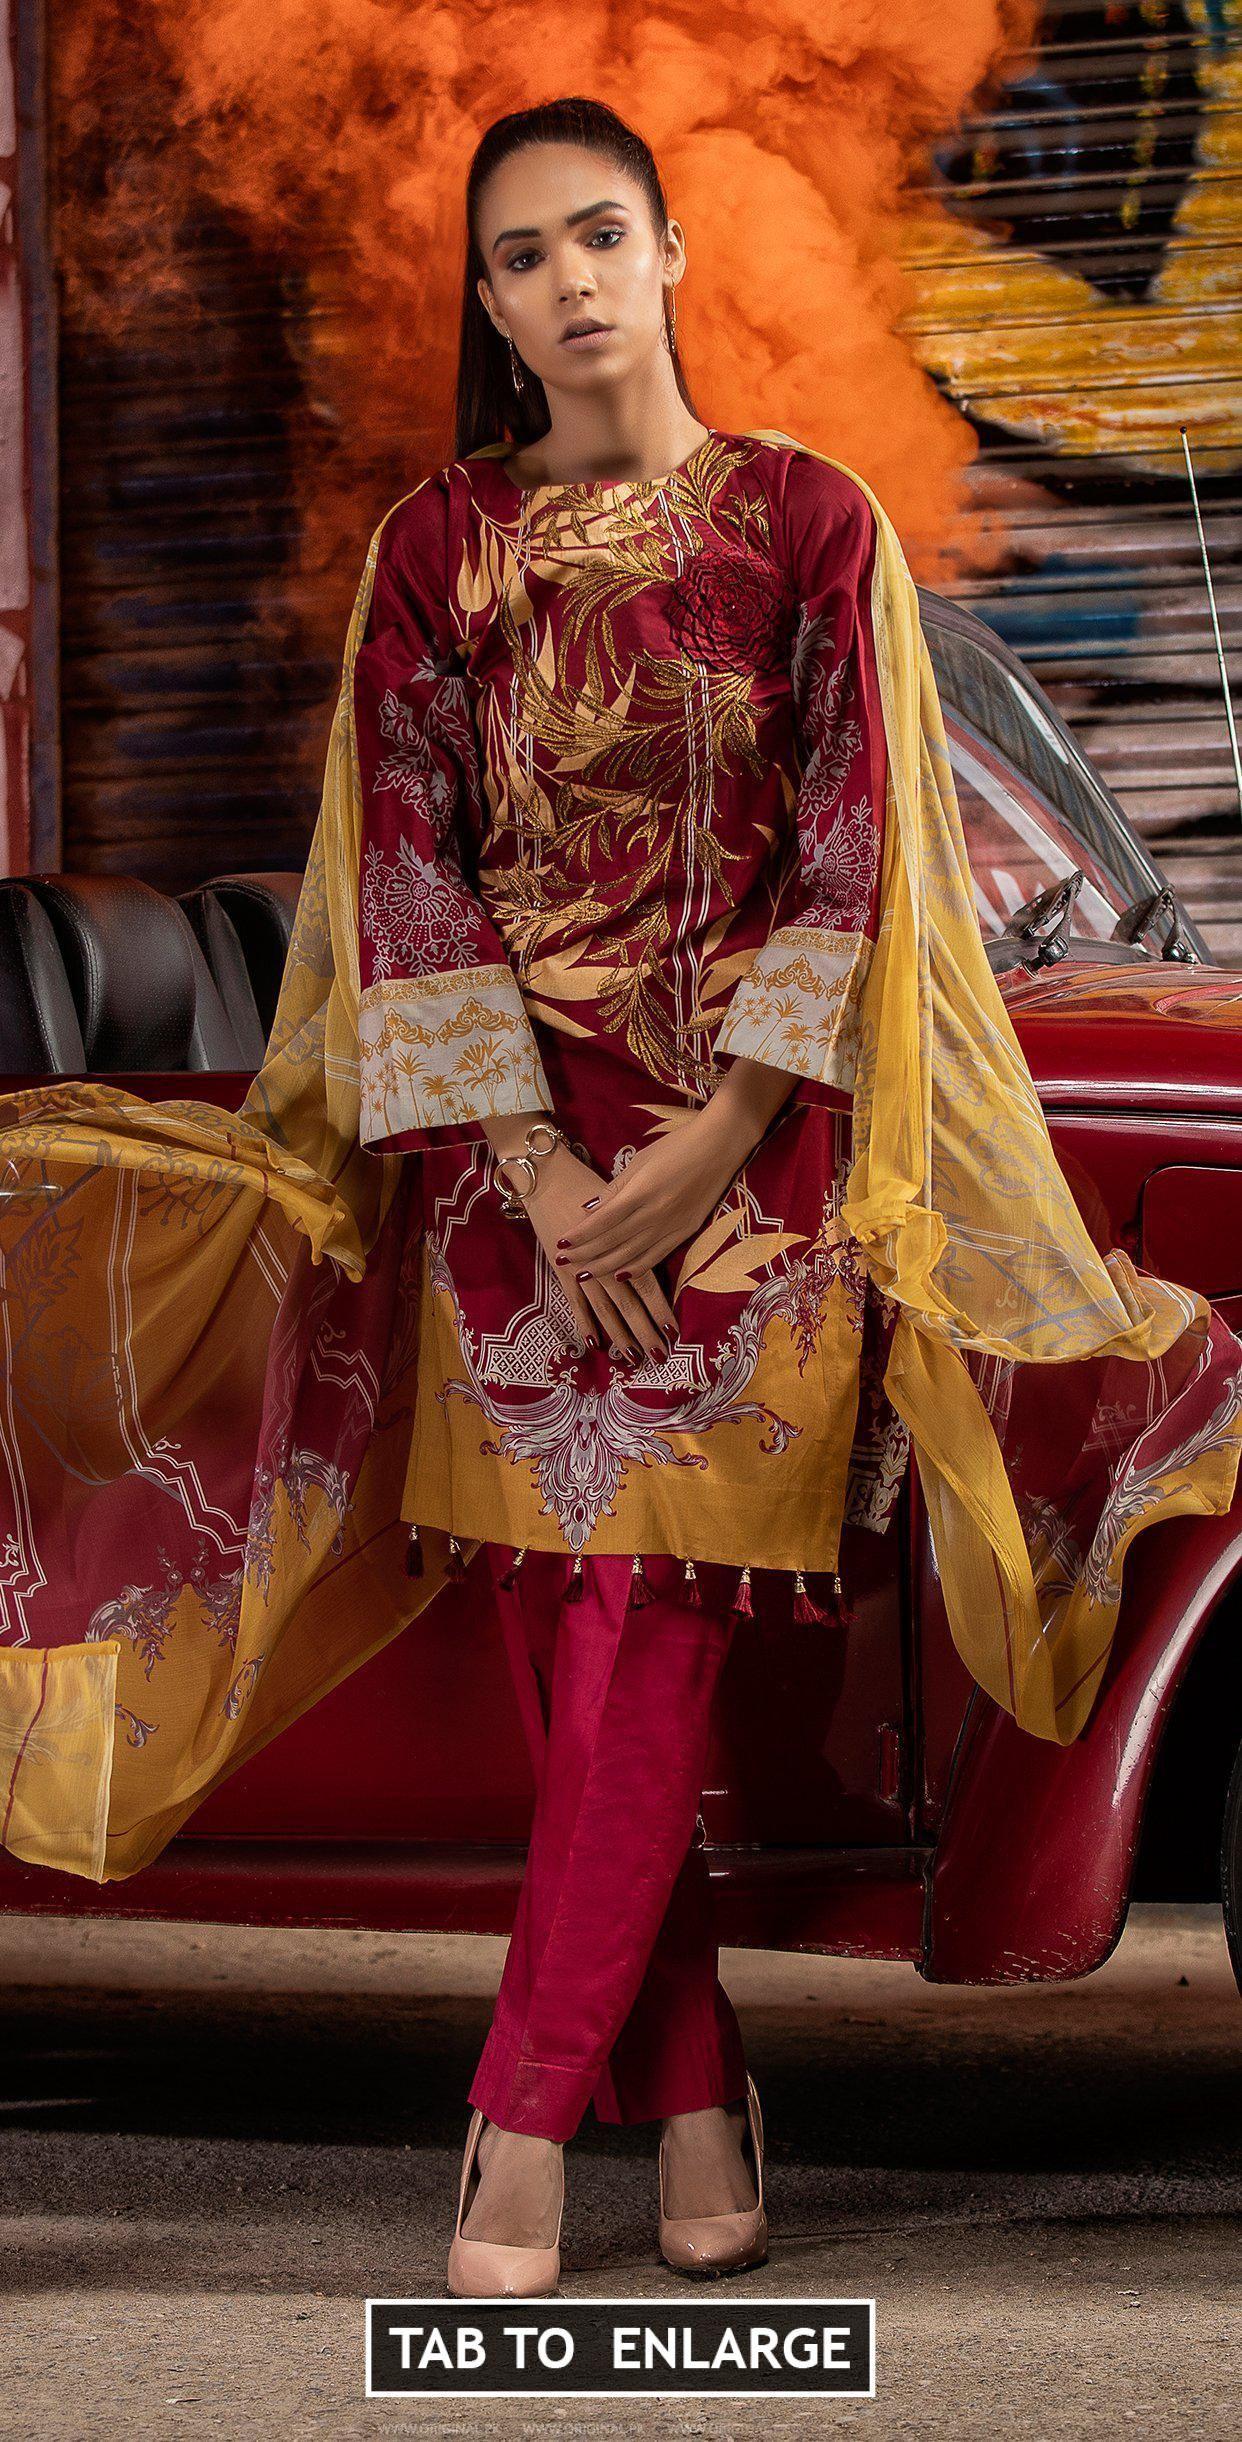 1c6f327901 Silkoria Lawn Embroidered RC-145B 2019 #LawnEmbroidered #RC-145B2019  #Silkoria #